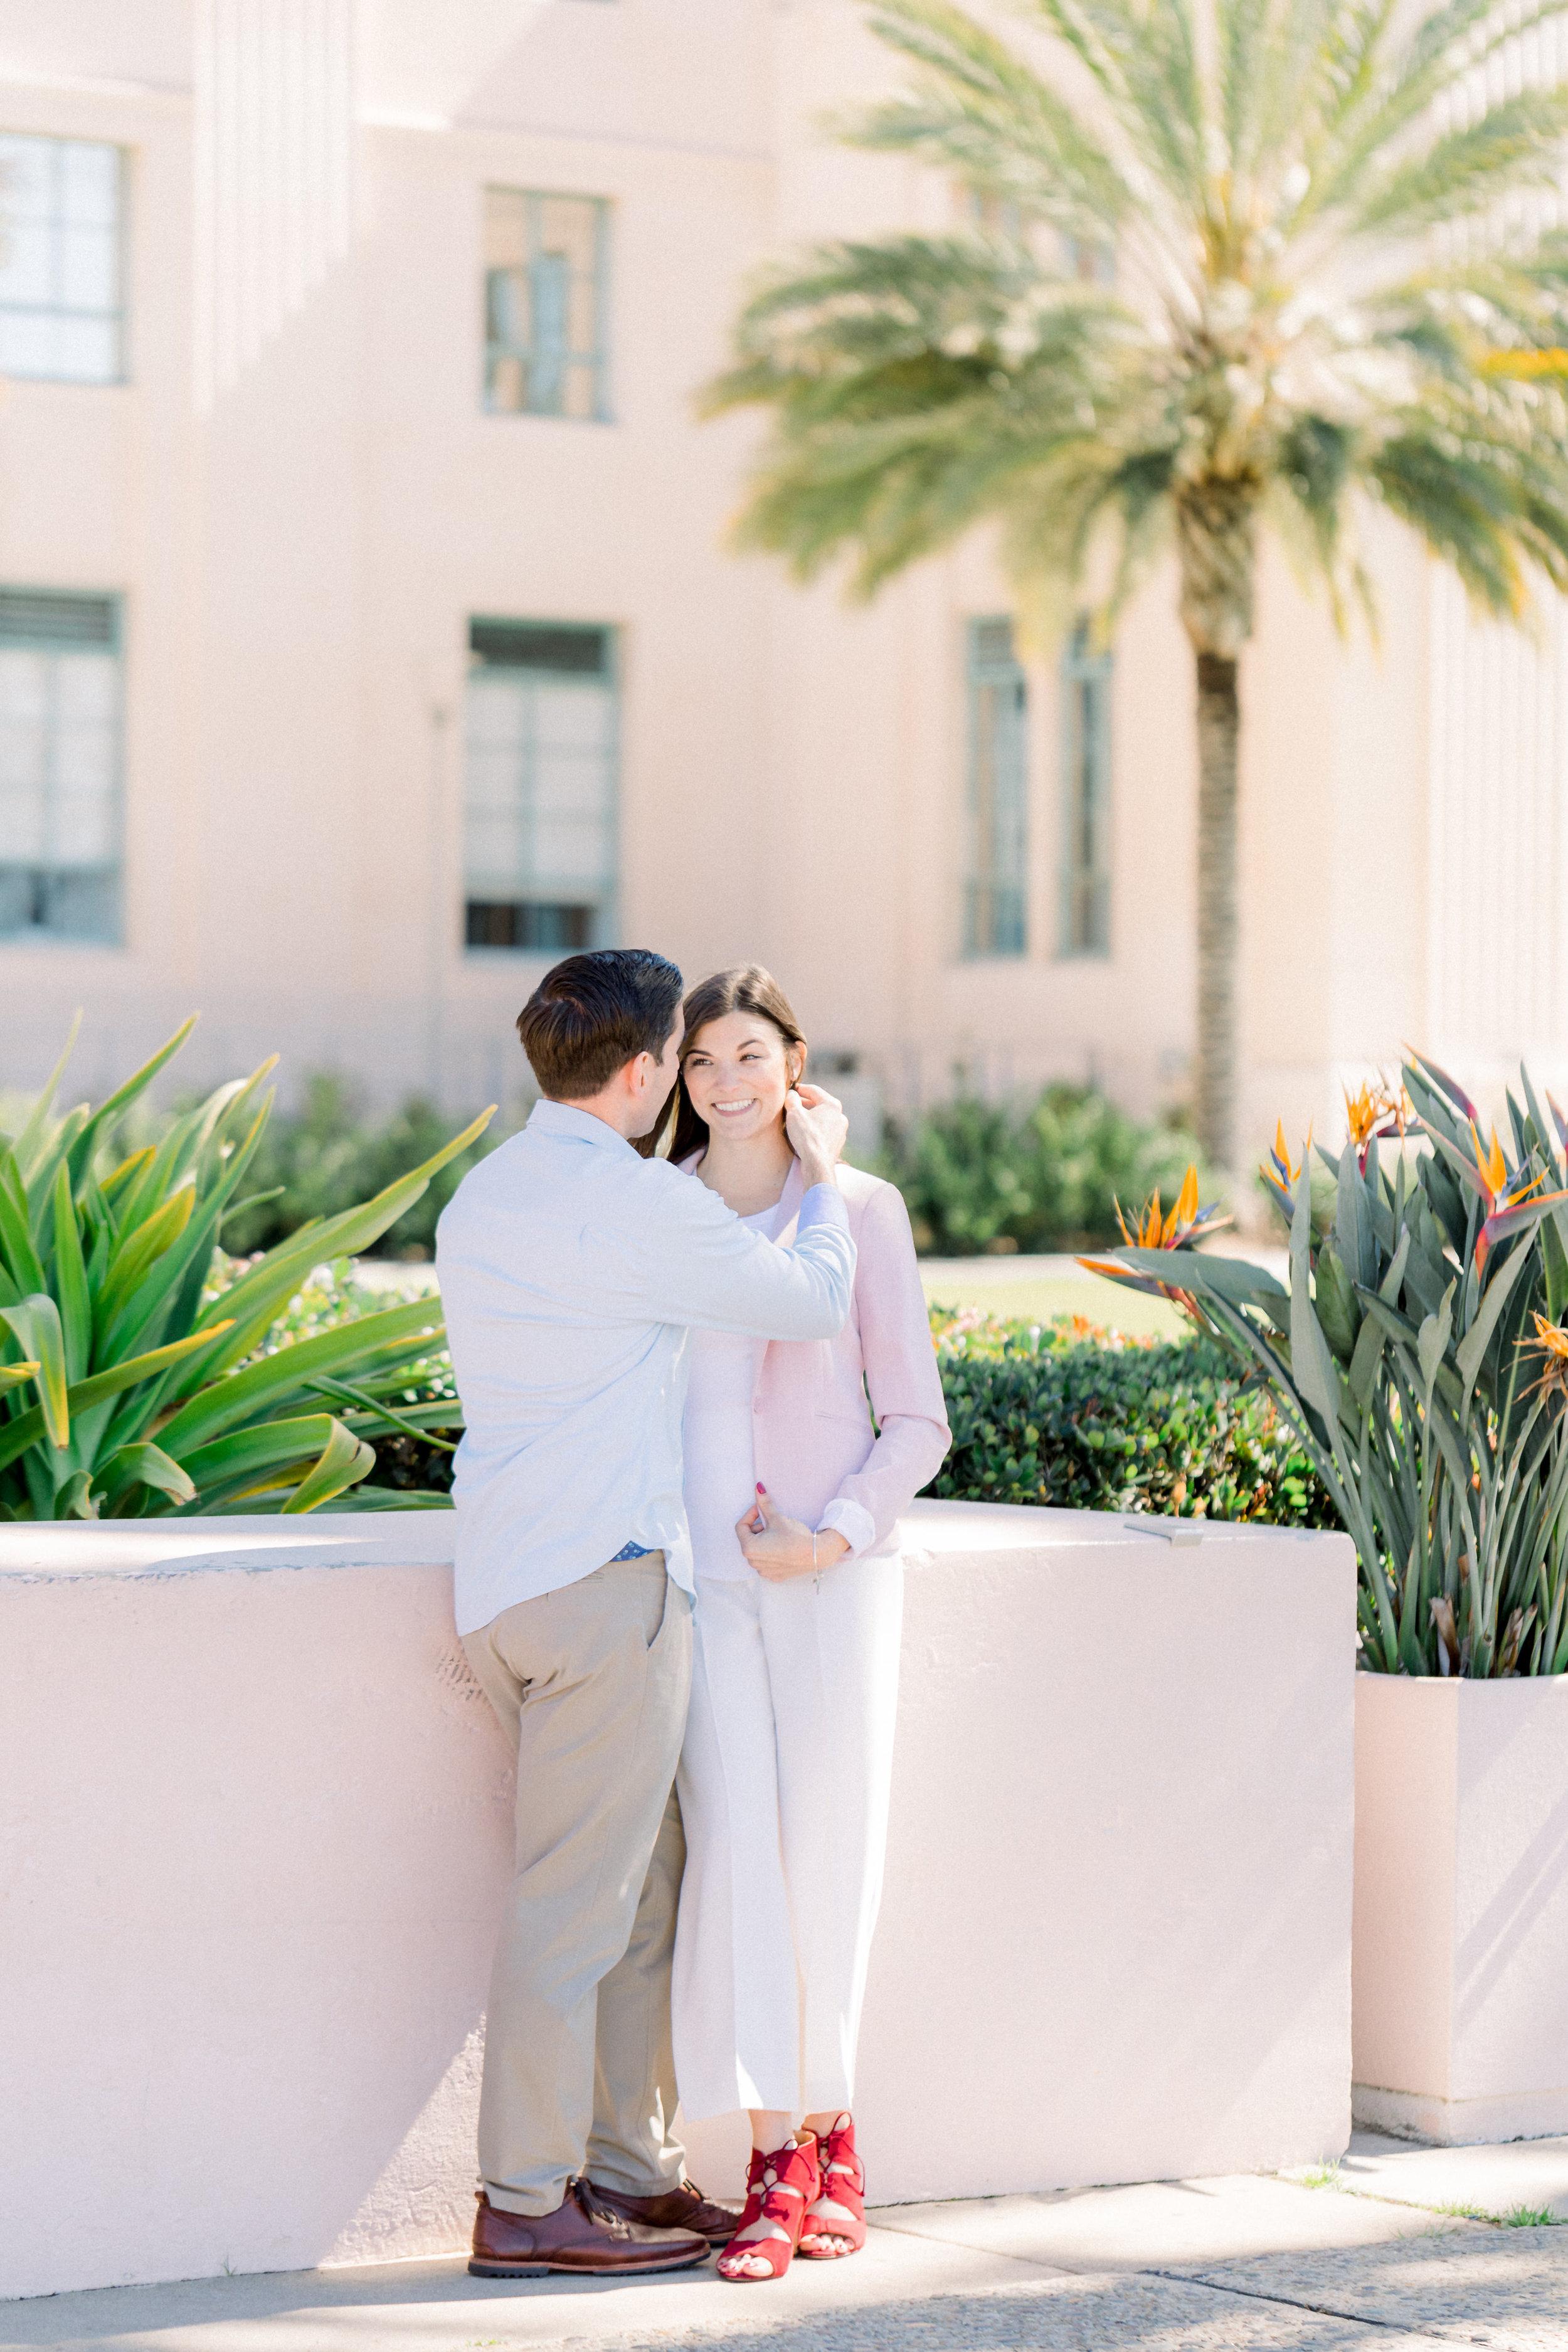 Claire_and_Dan_San_Diego_Administration_Building_Elopement_Alyssa_Boynton_Photography-39.jpg